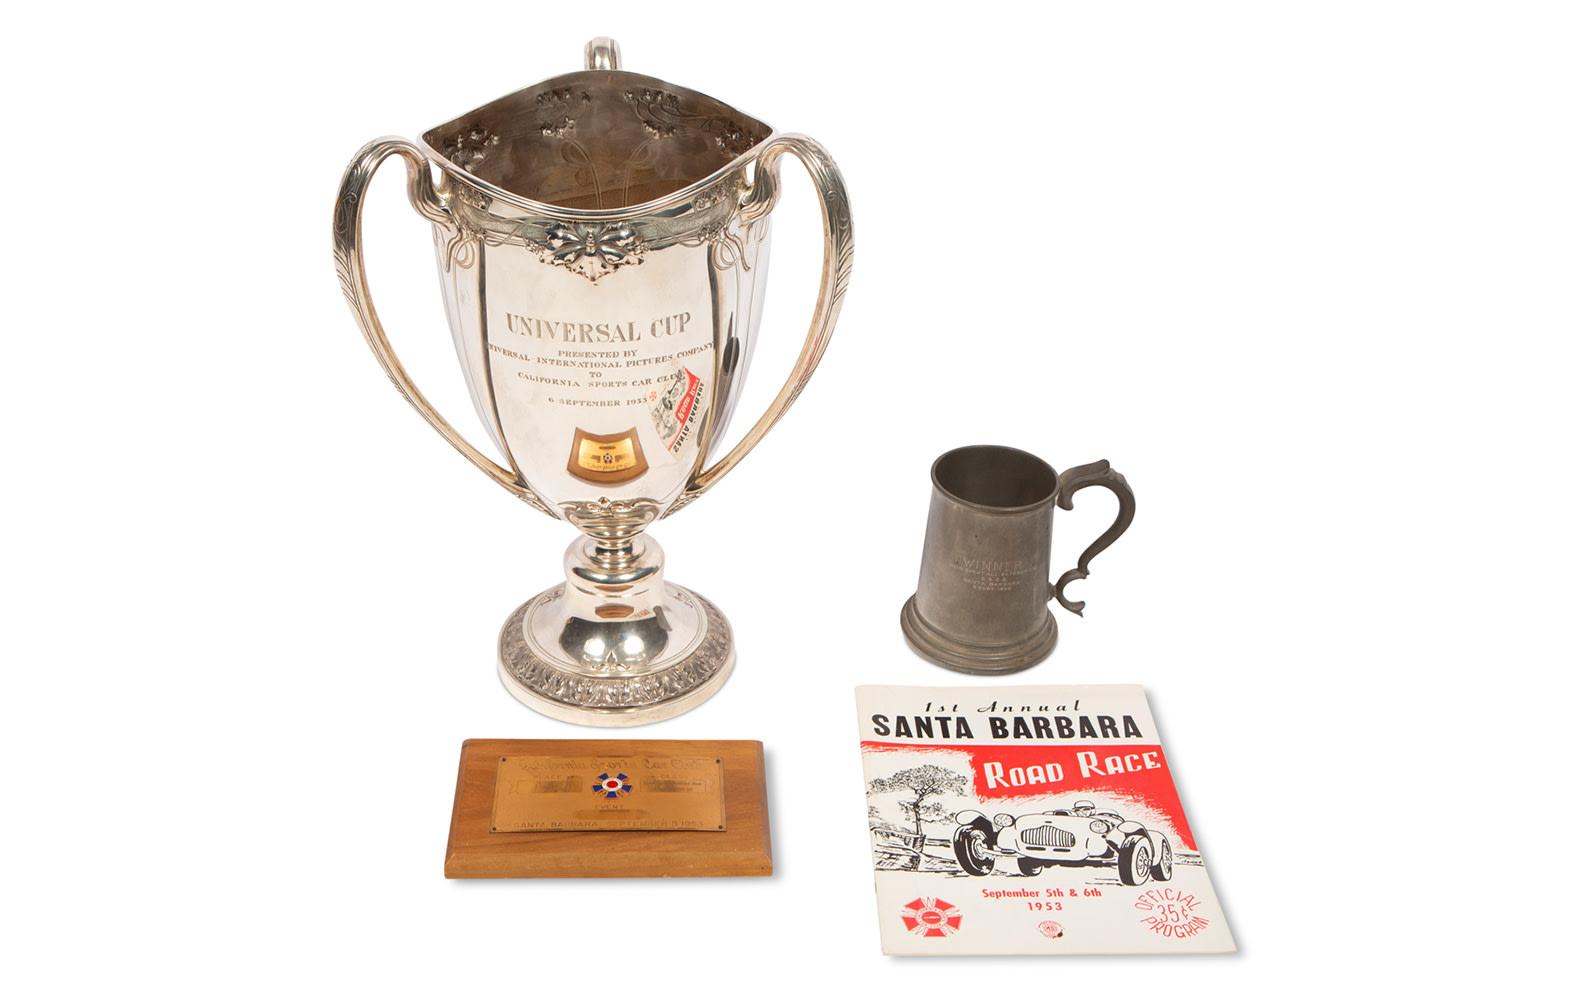 1953 Santa Barbara Road Race Trophies and Race Program